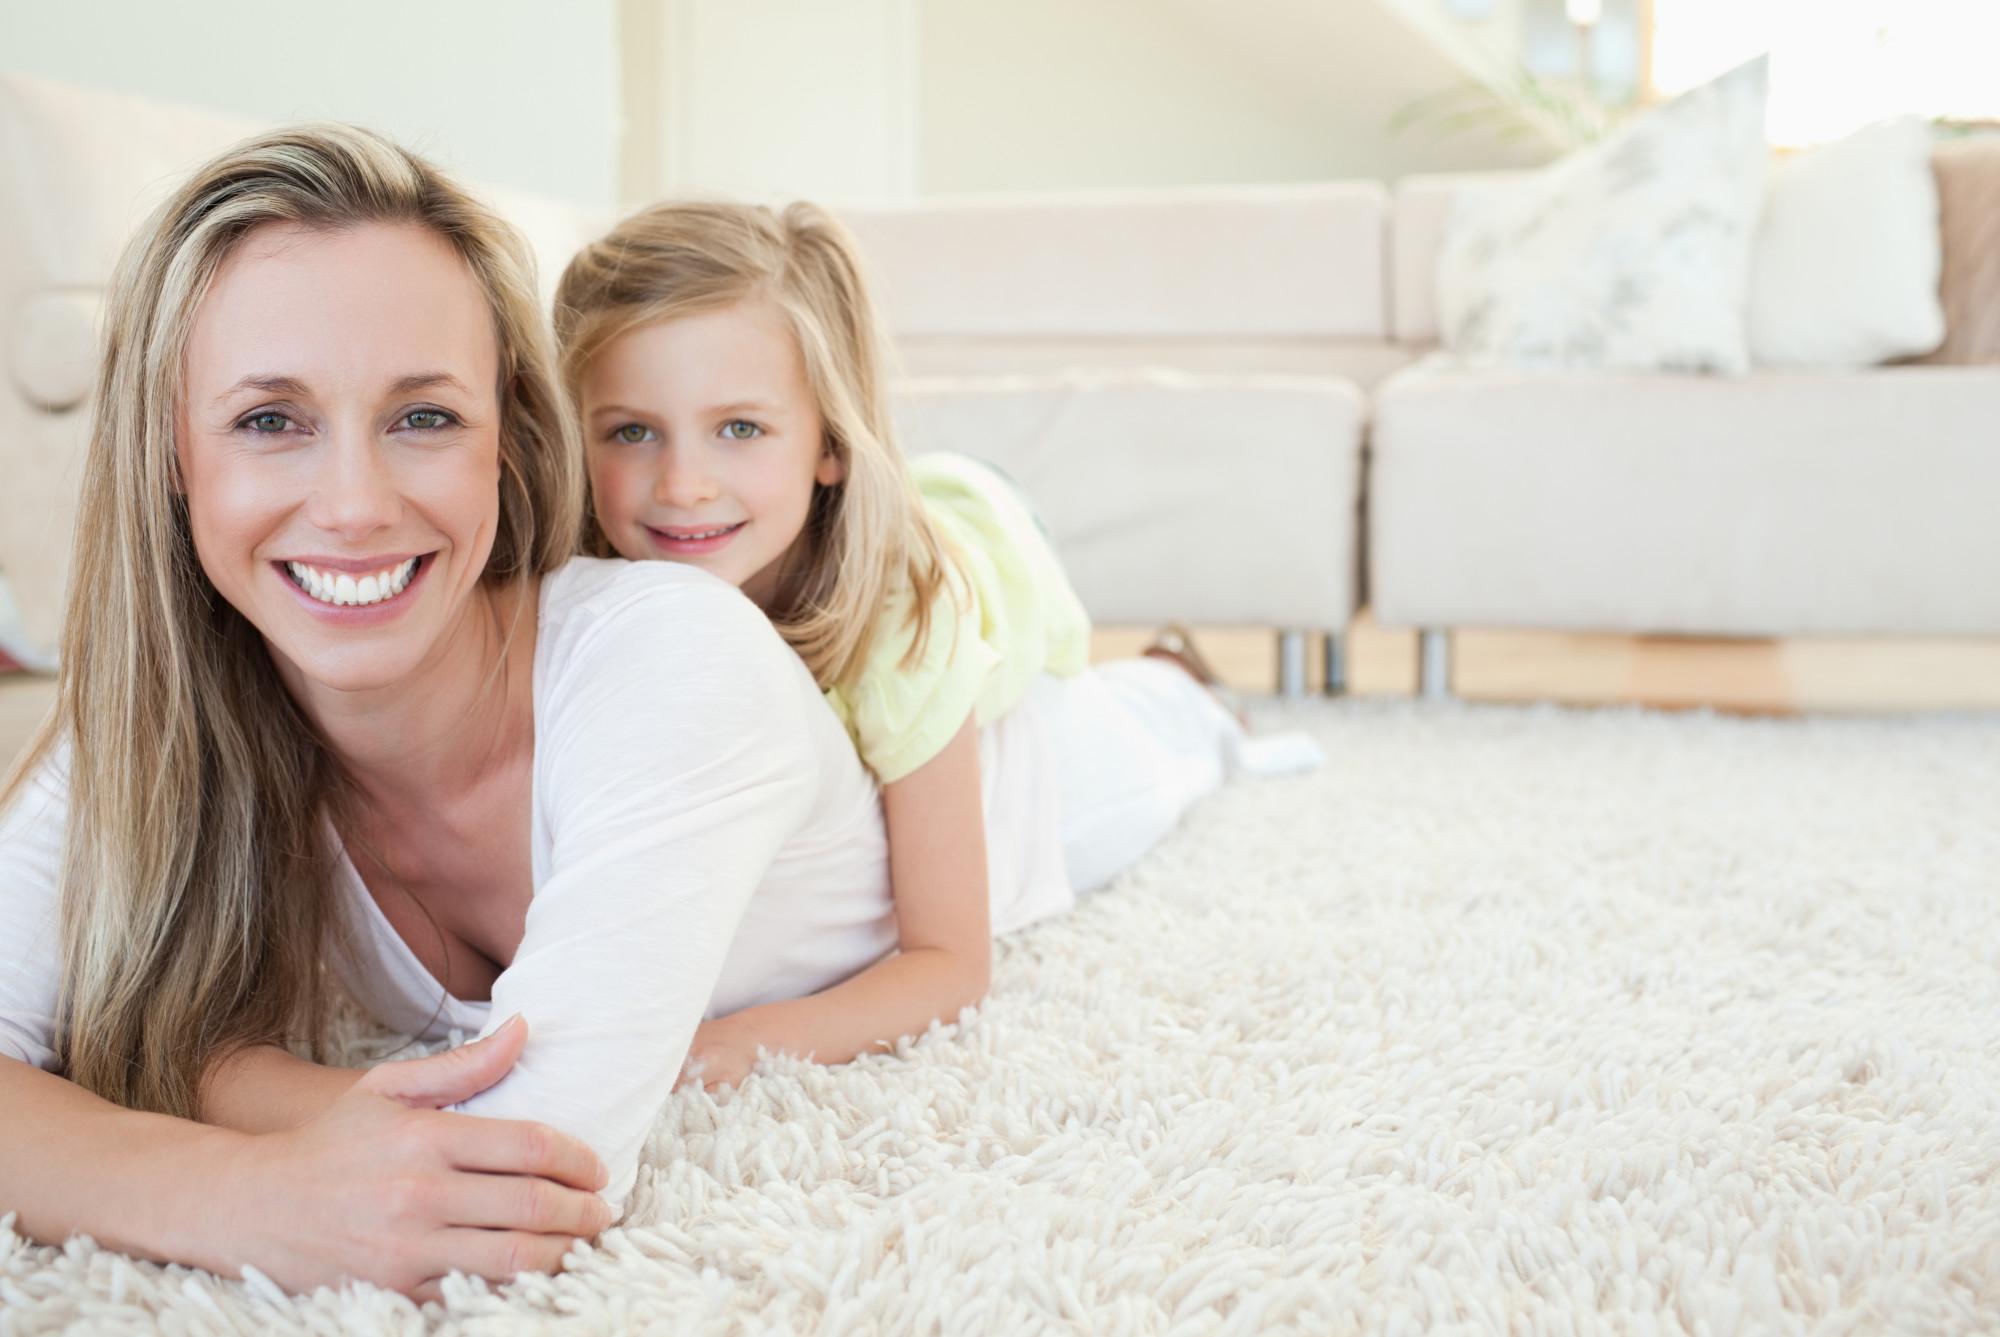 happy family faces on clean carpet Slidell LA